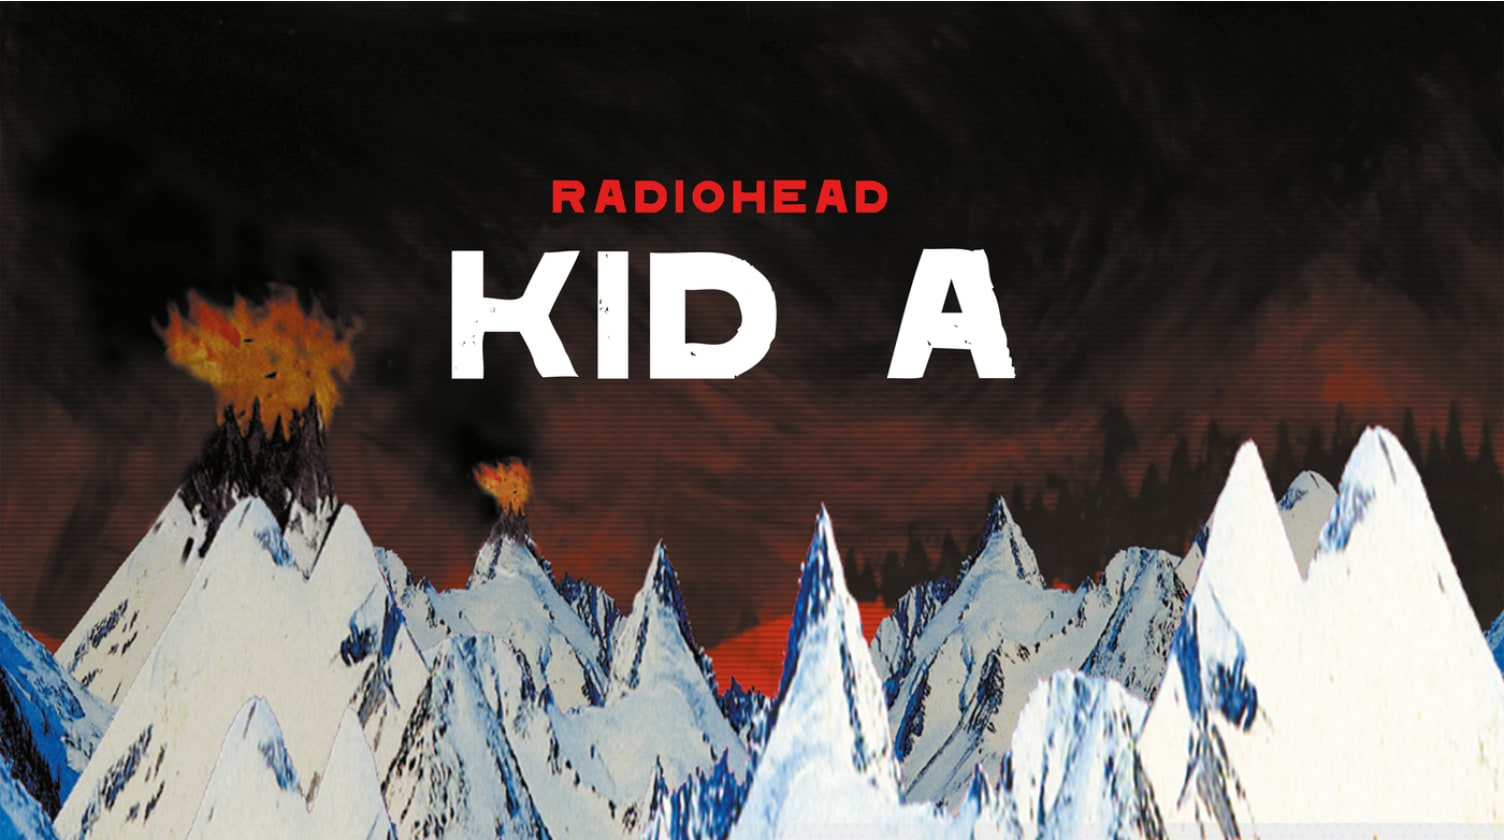 Radiohead, Kid A